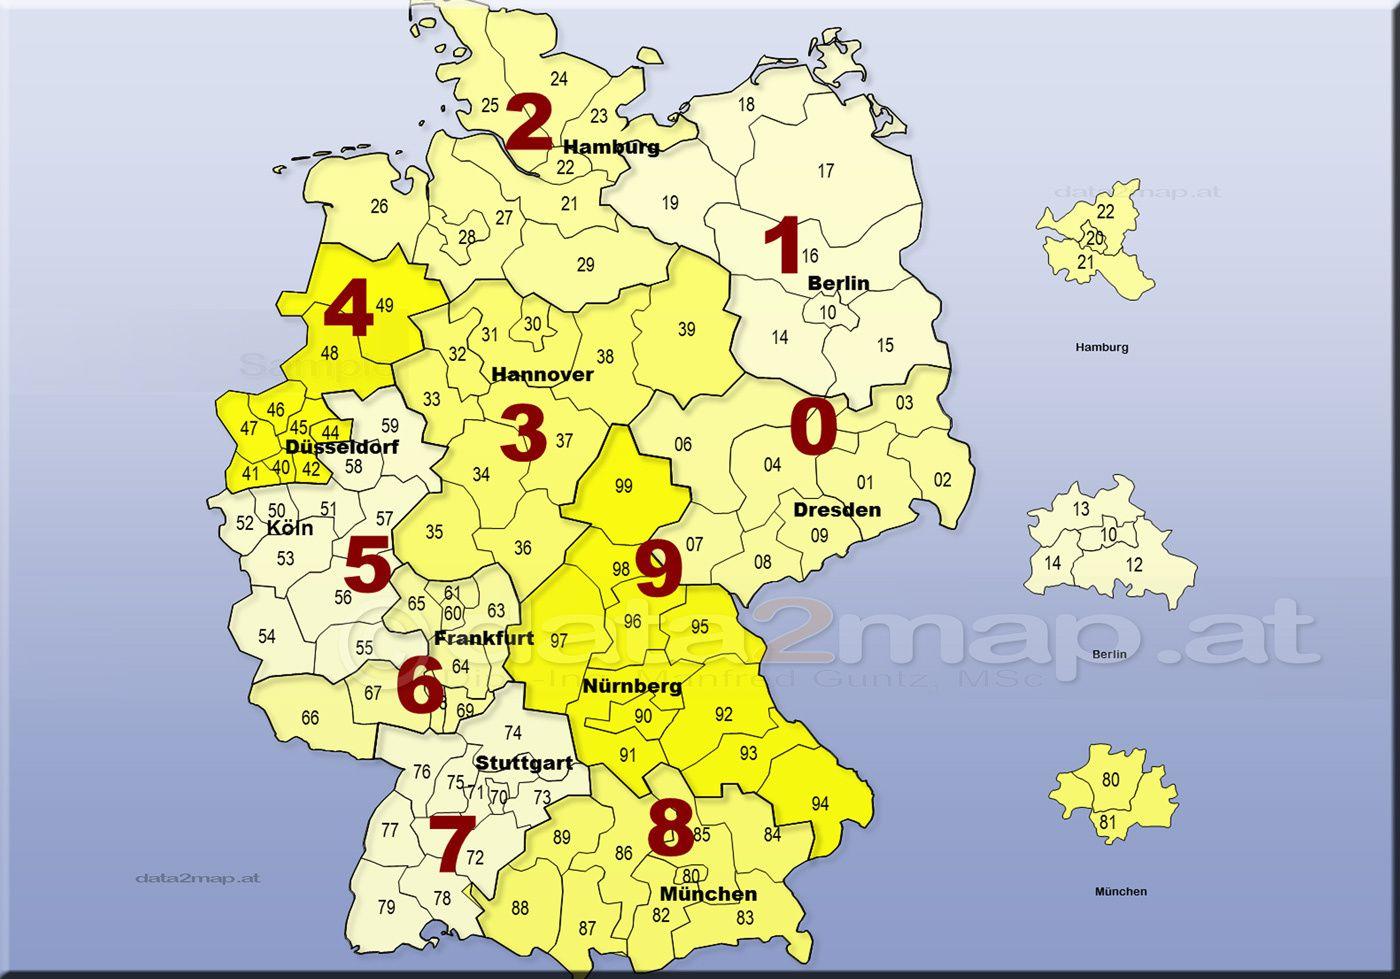 Deutschland Karte Plz Deutschland Karte Karte Deutschland